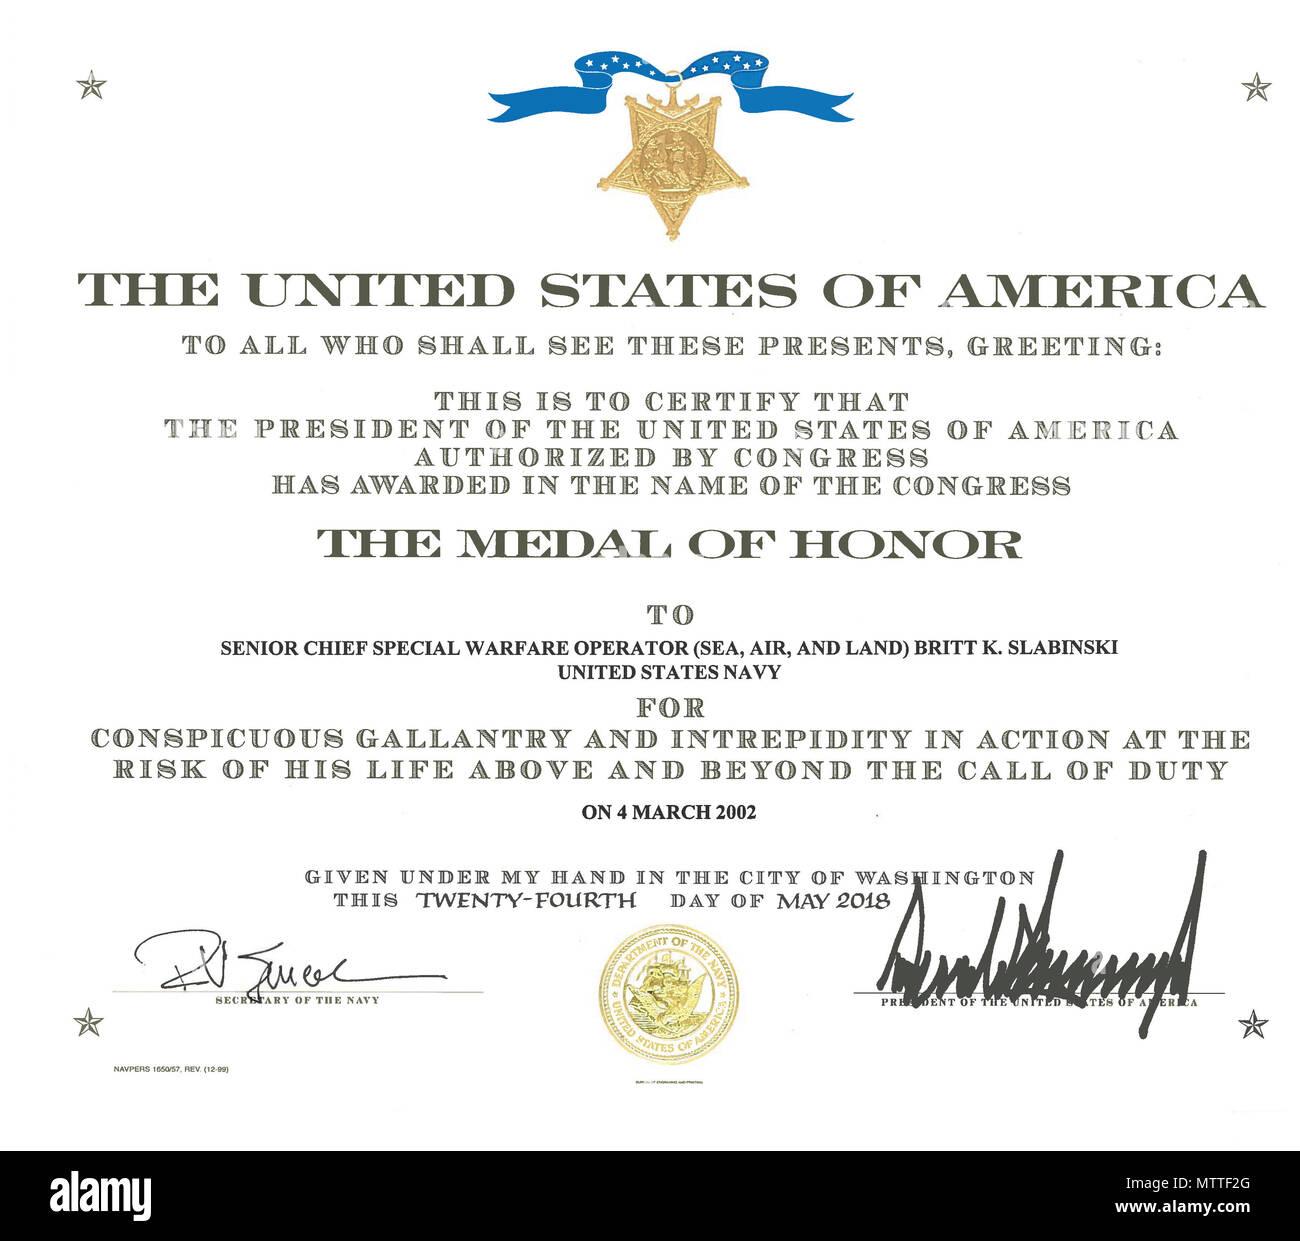 Asombroso Certificación De Washington Maestro Adorno - Certificado ...